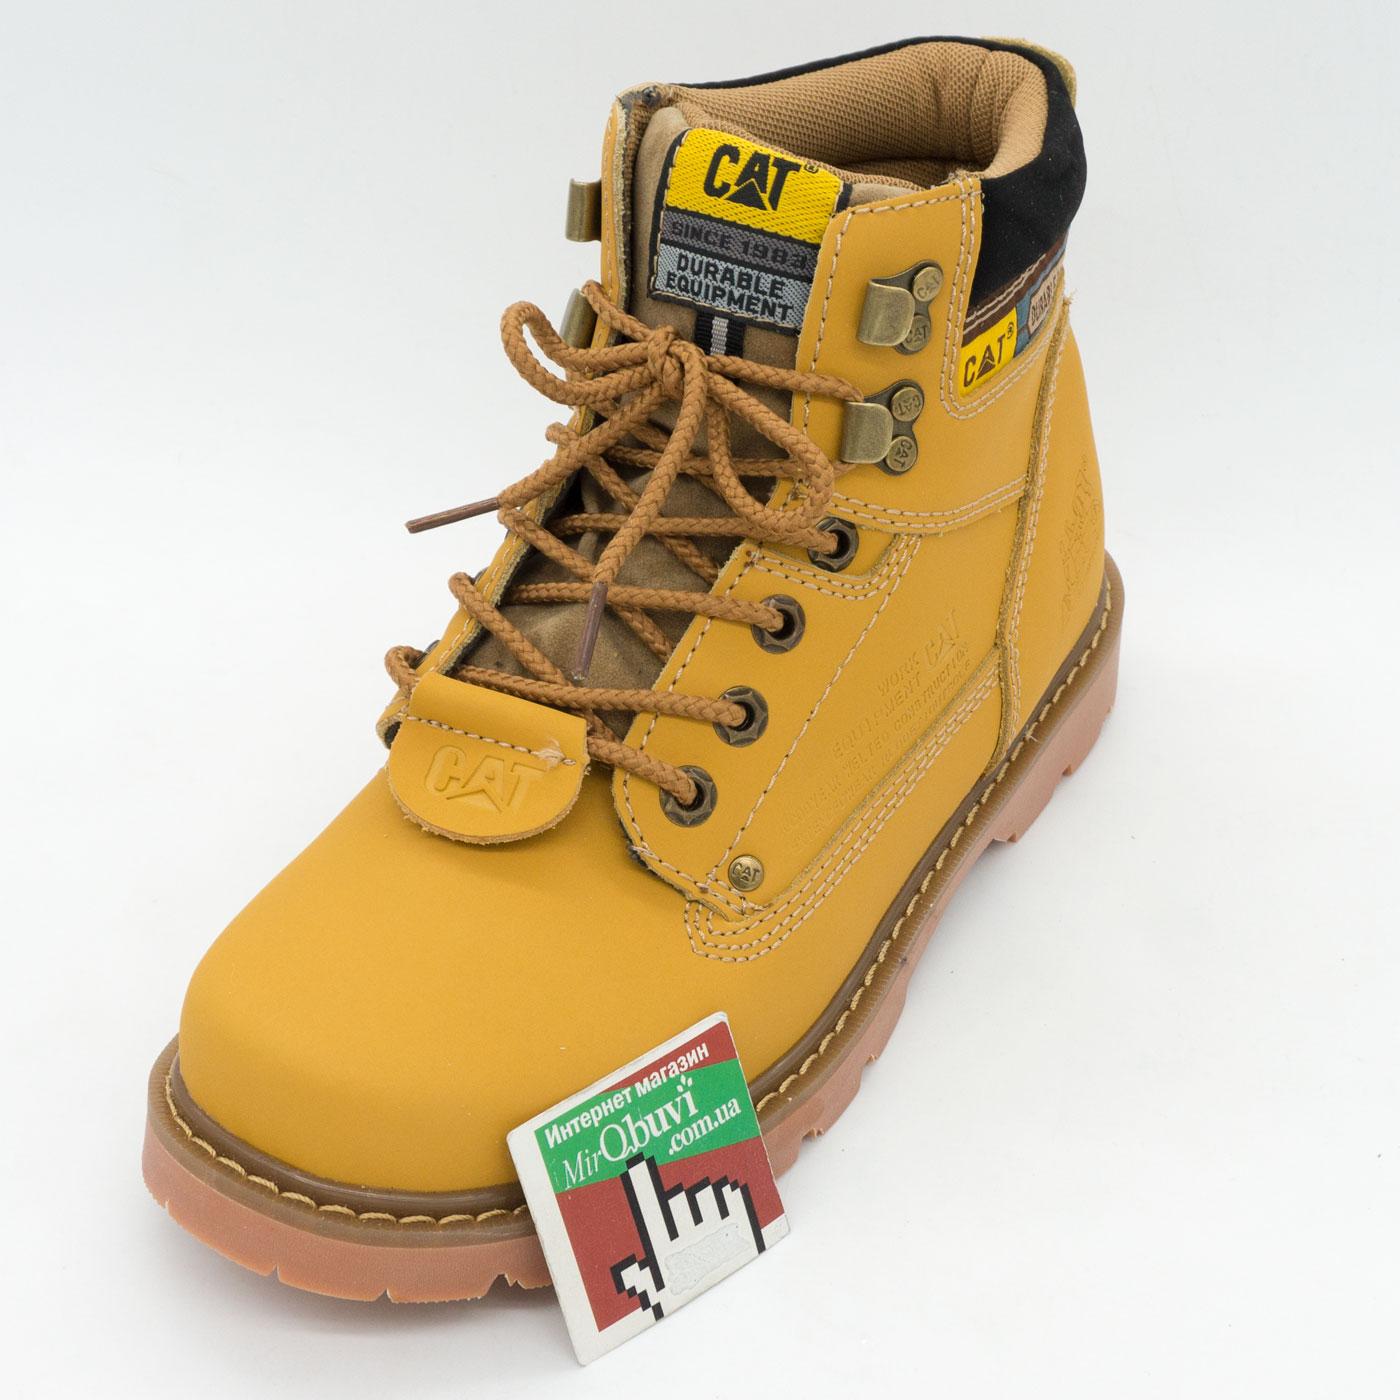 фото front Желтые женские ботинки CAT (катерпиллер)  front